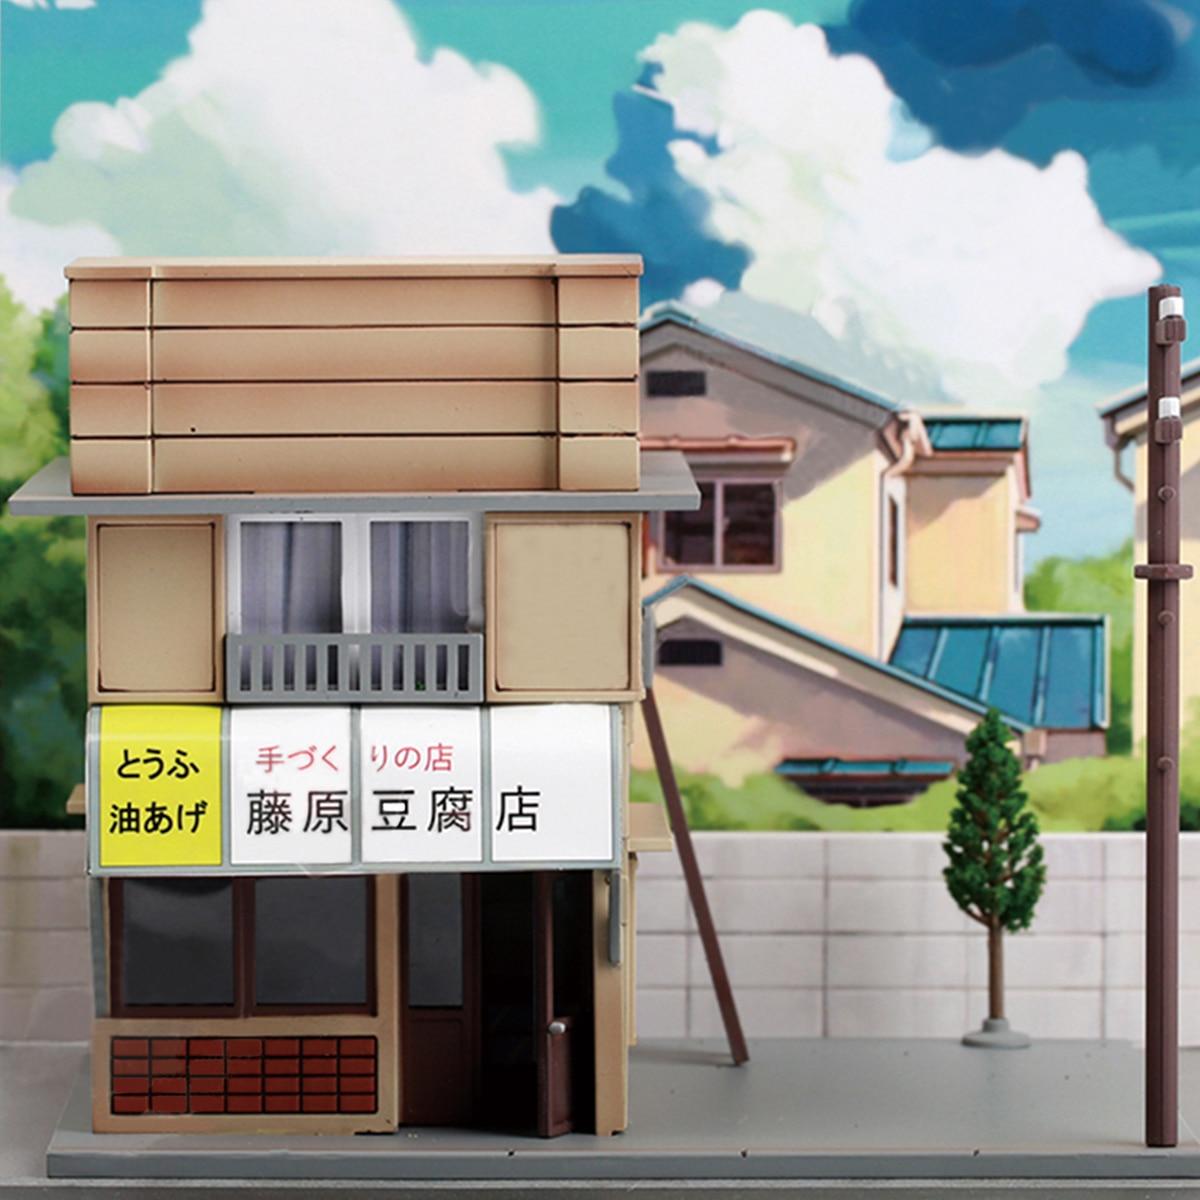 1:64 1Set  Architecture For Initial D Fujiwara Tofu Shop Kit Diorama Set Not Include Any Cars Scene LED Model Building Shop